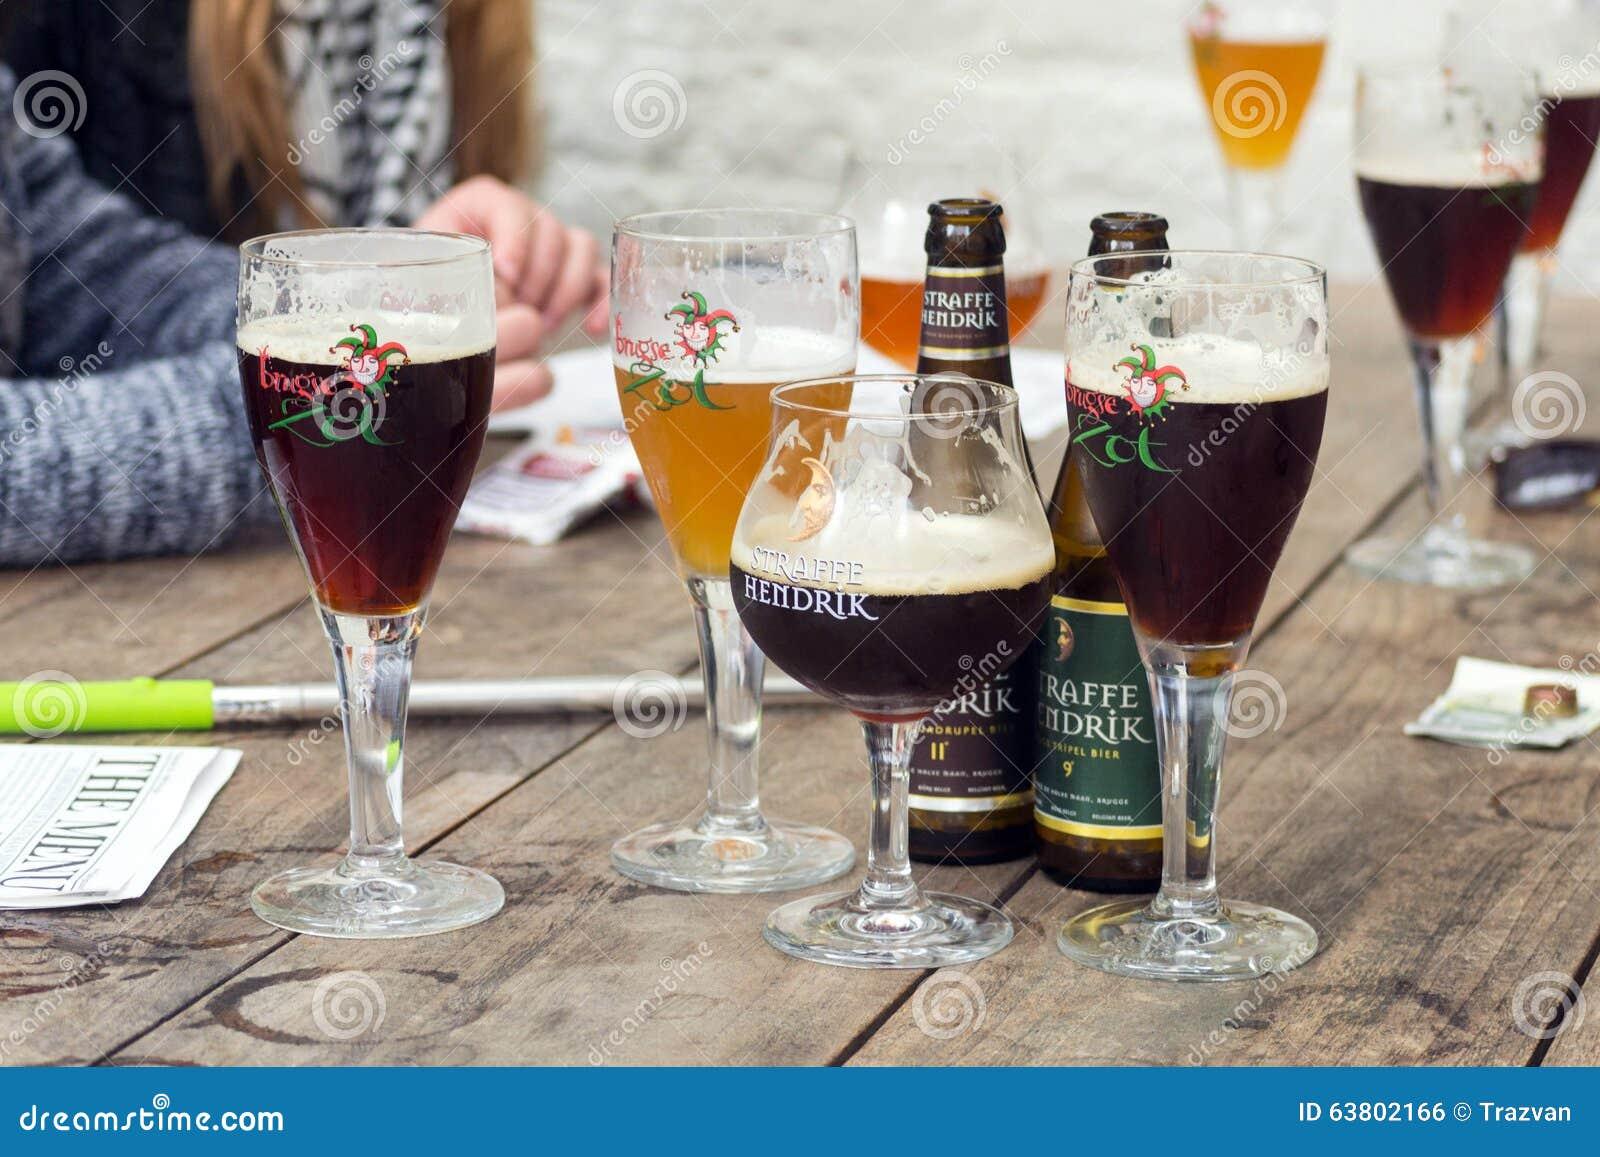 Half Moon Brewery Straffe Hendrik Belgian Beer Glass